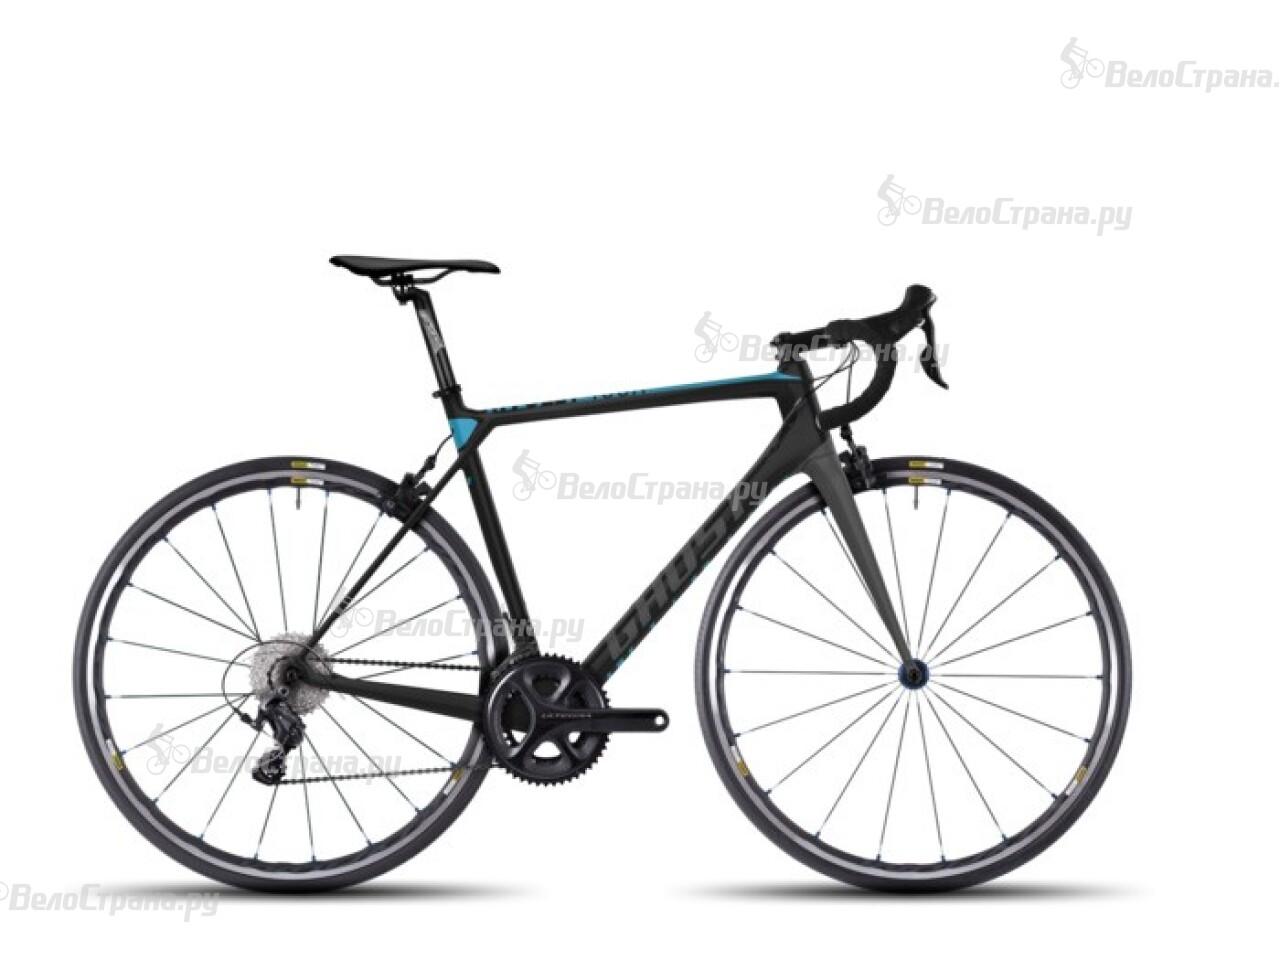 Велосипед Ghost Nivolet LC Tour 4 (2016) конденсатор lc 10uf 25v 4 5 4 smd 20 4 5 4